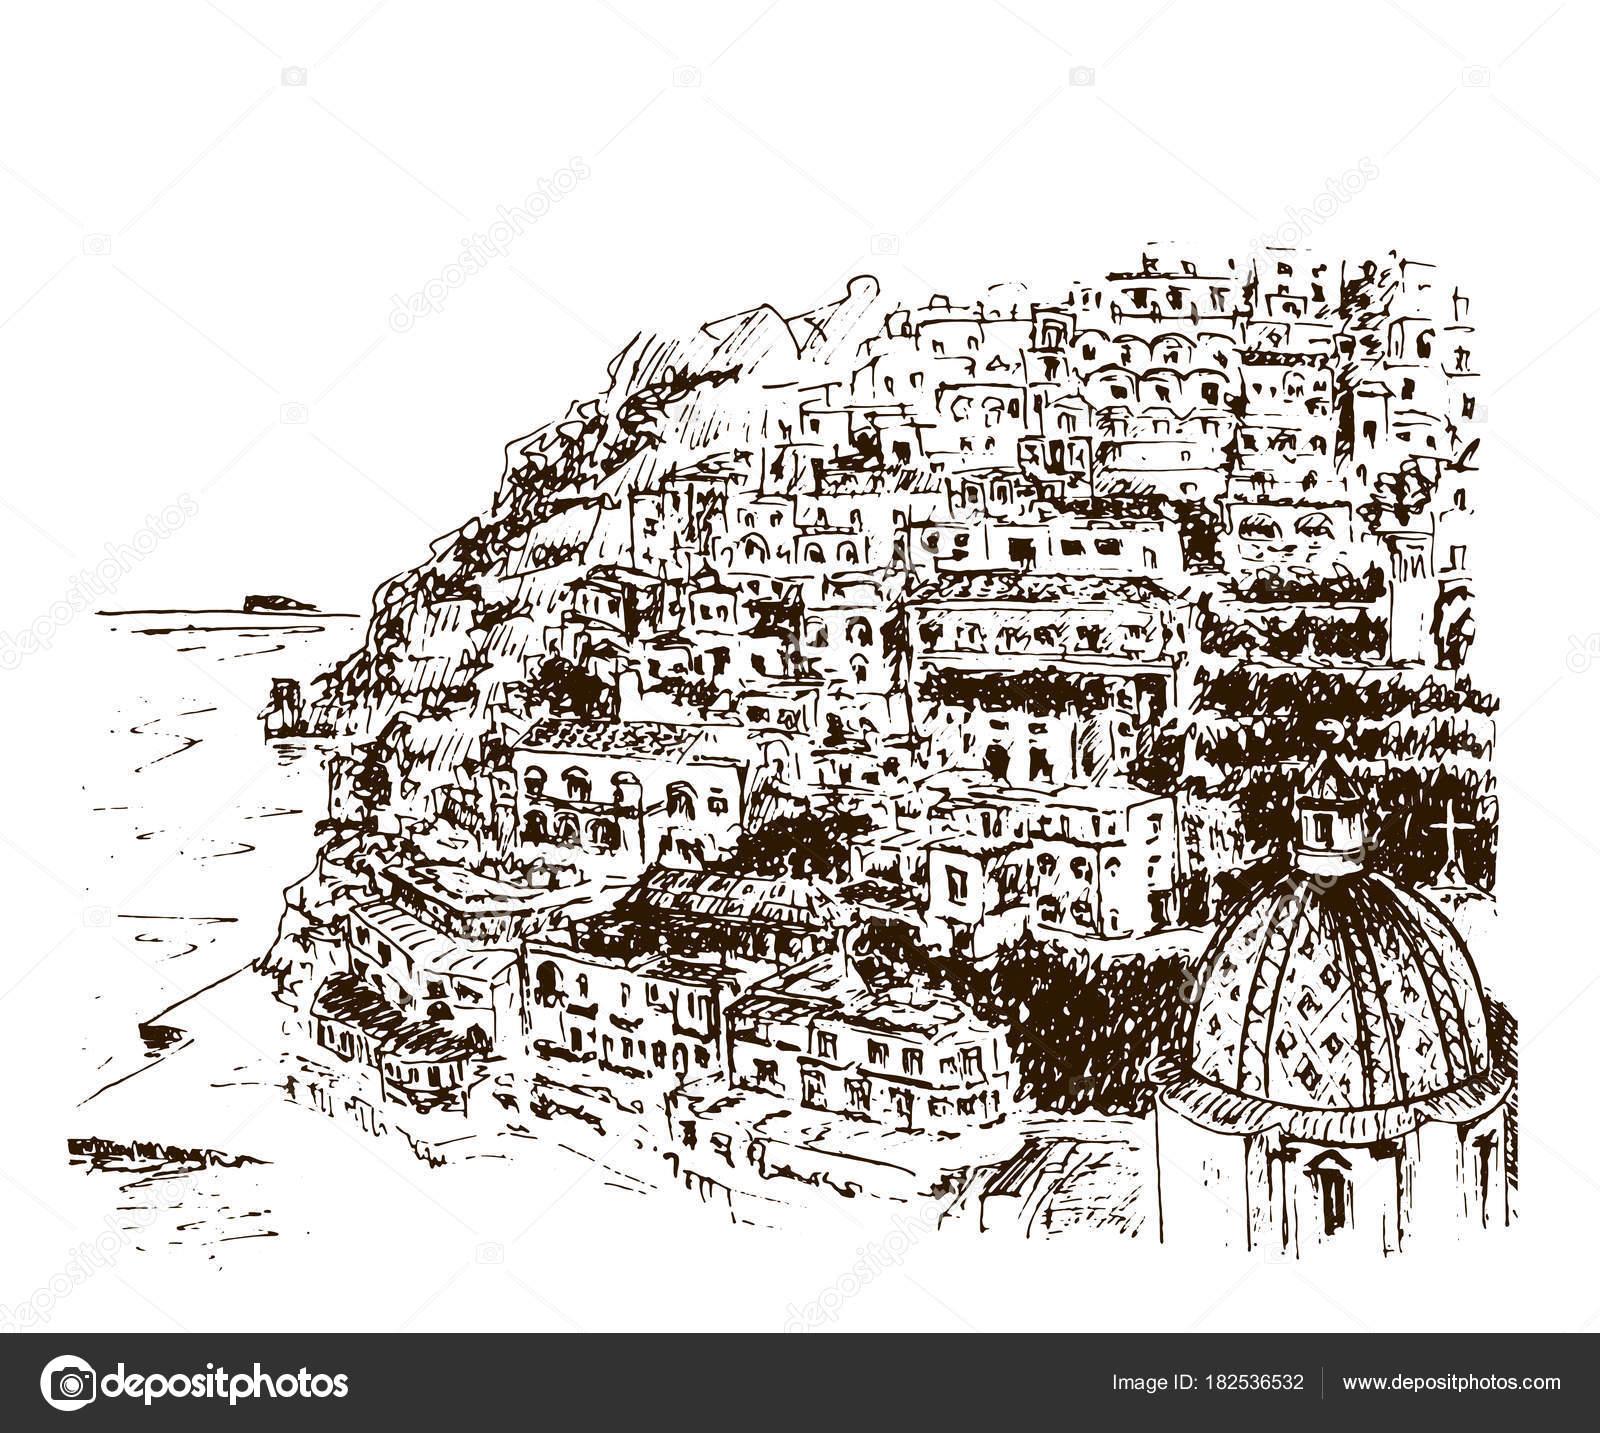 Dibujos Arquitectonicos A Lapiz Faciles Positano Costa De Amalfi